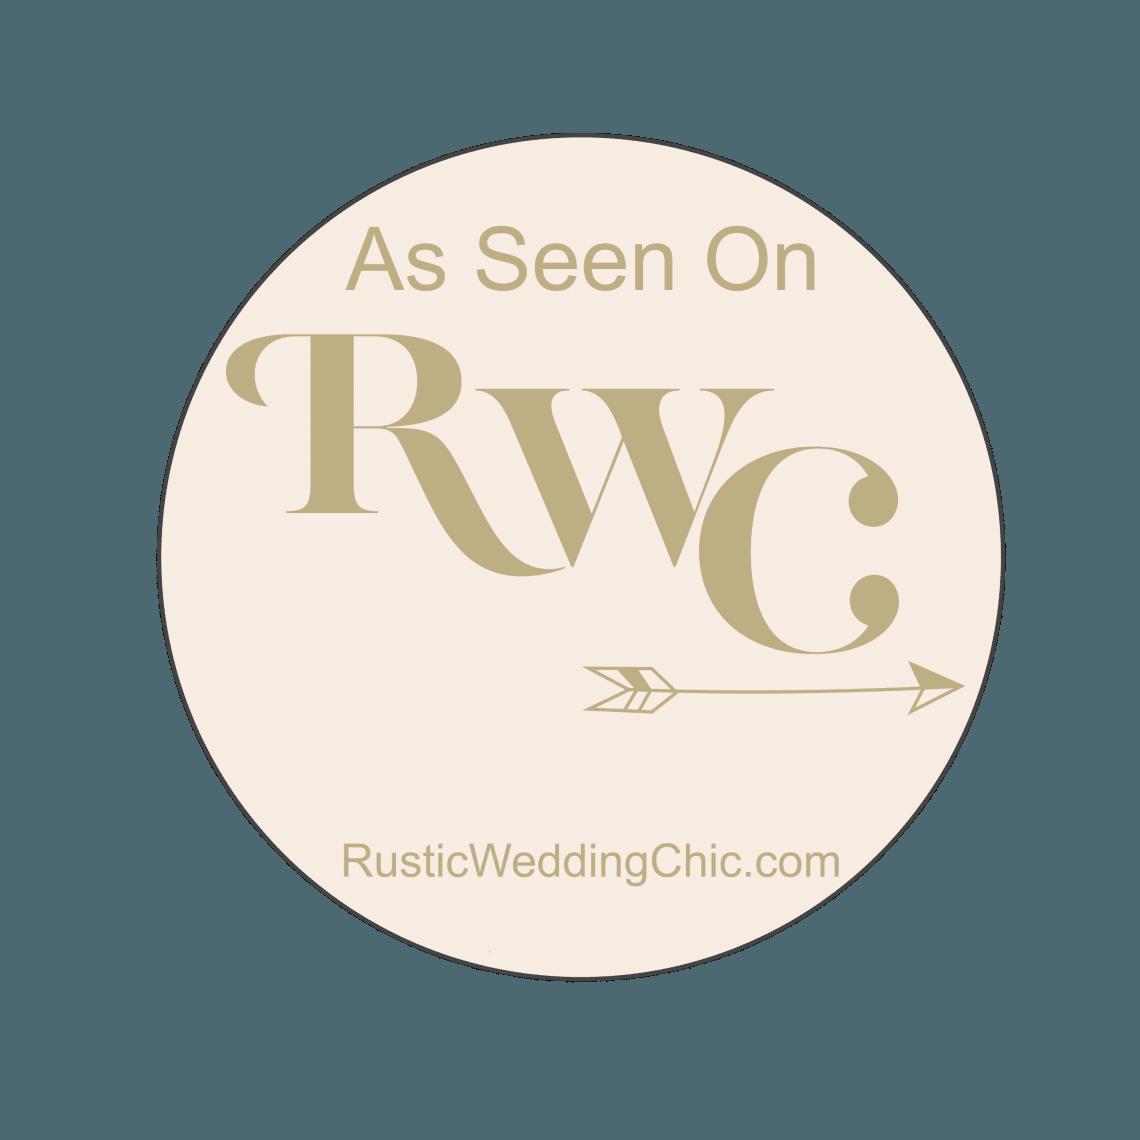 RWC_badge.png